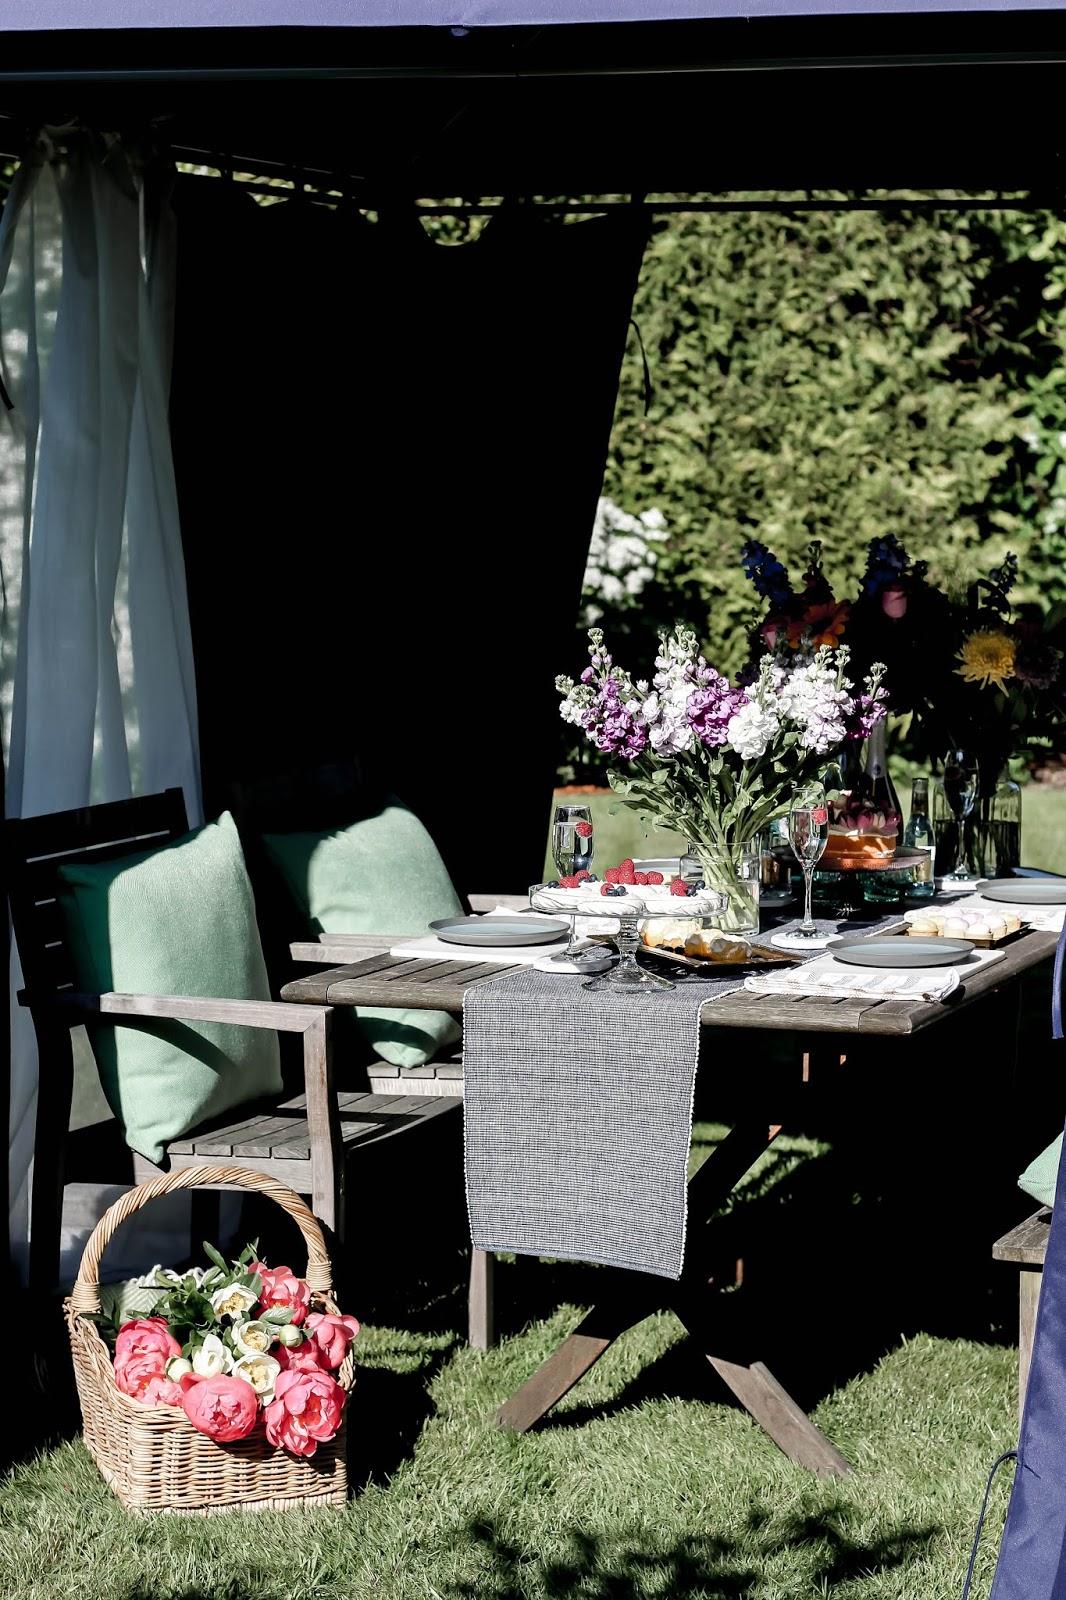 Summer Al Fresco Dining Afternoon Tea Outdoors